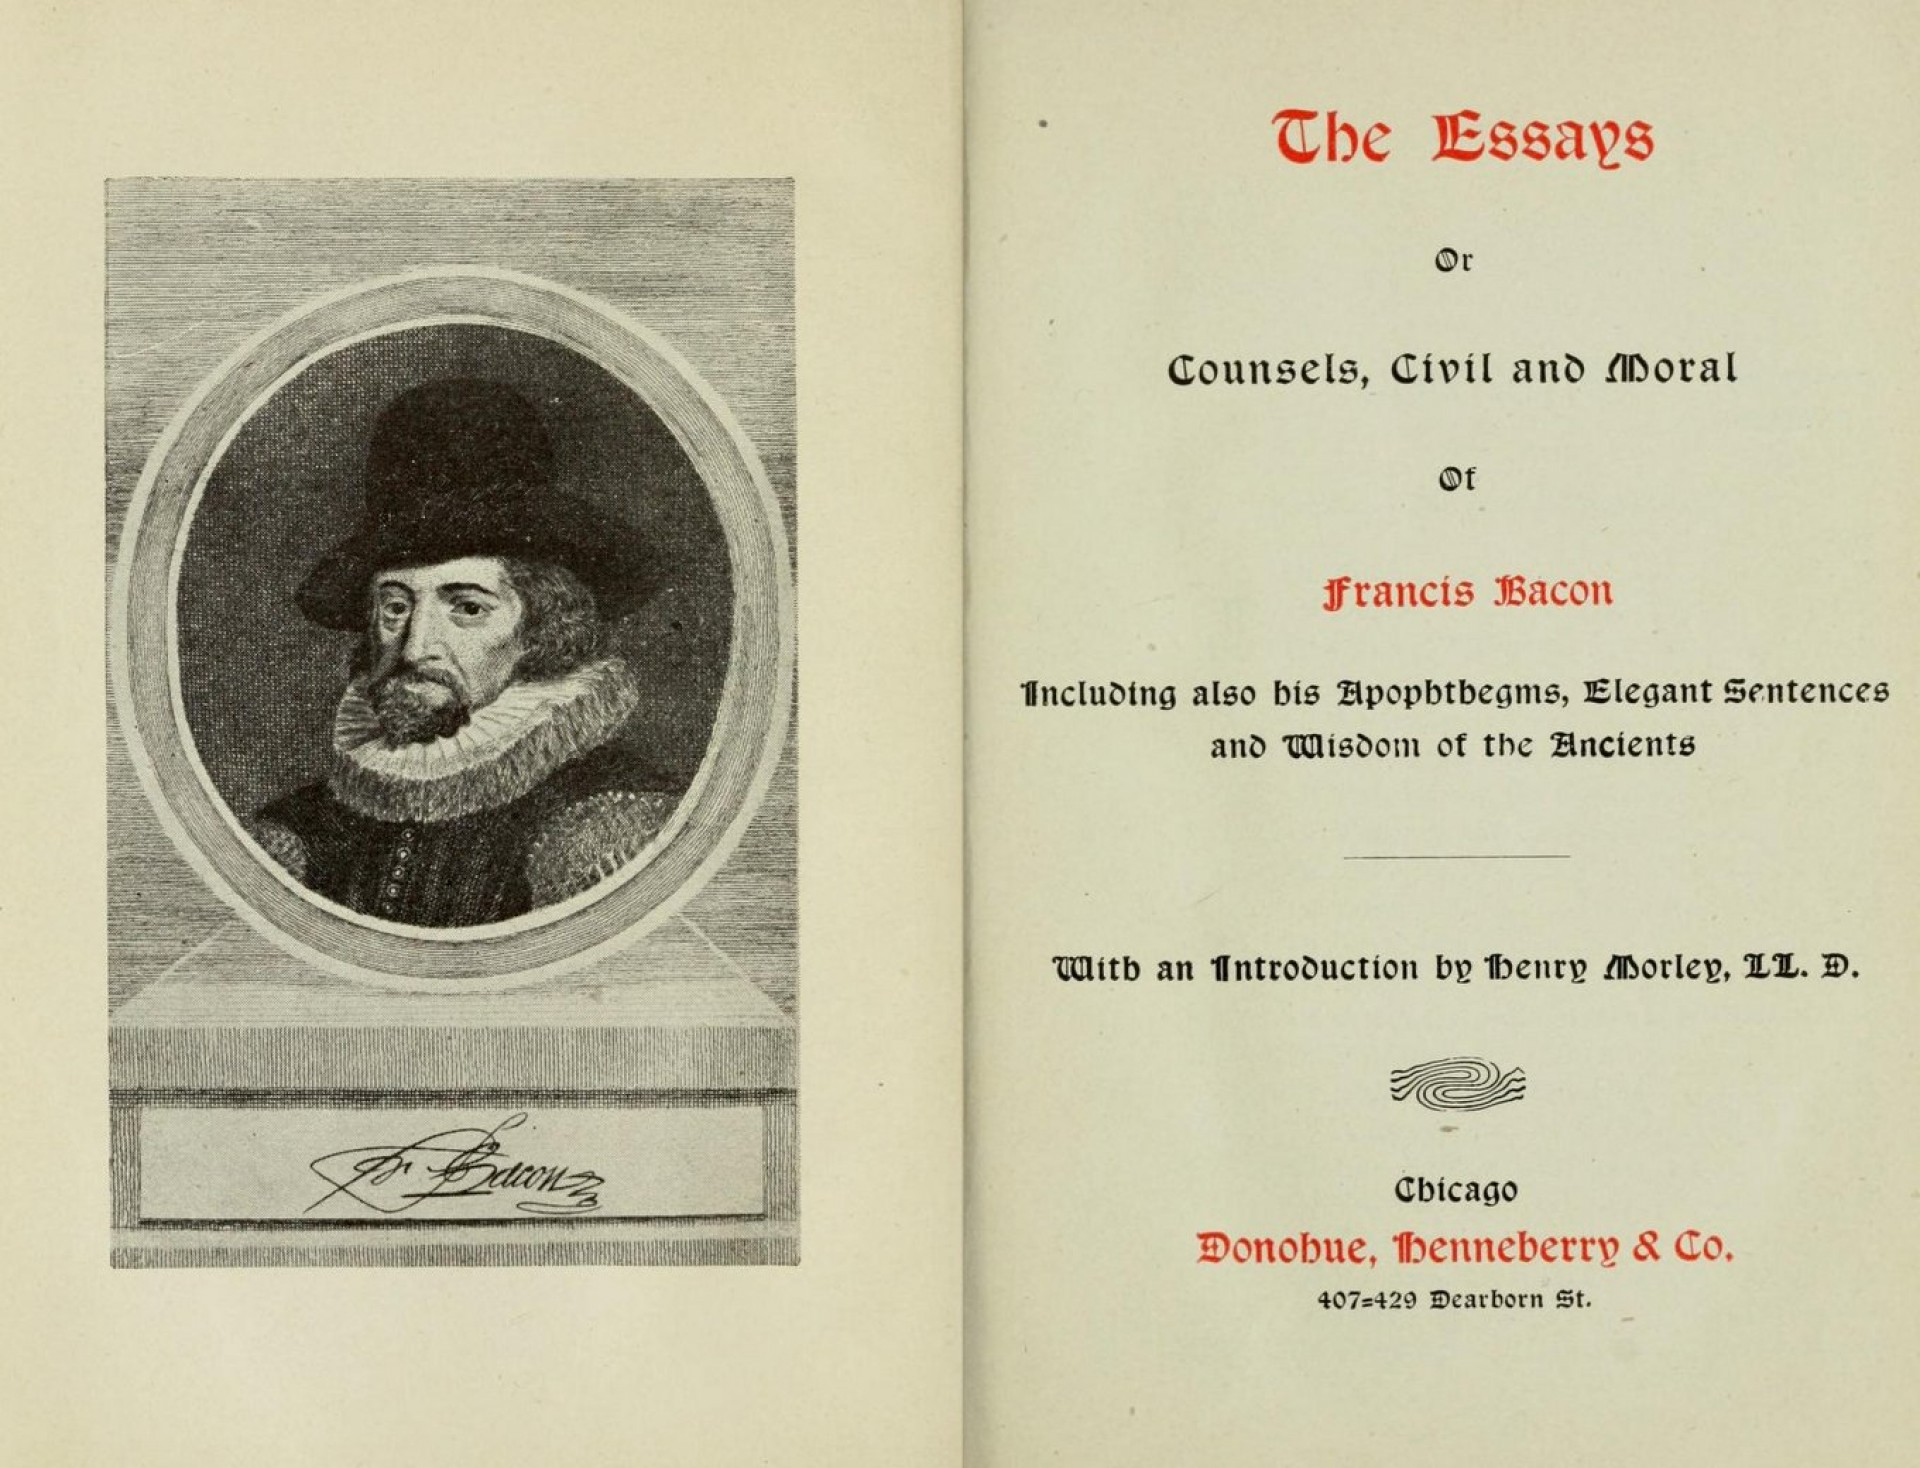 014 Essay Example Francis Bacon The Essays Amazing Bacons In Urdu Pdf Of Truth Summary 1920